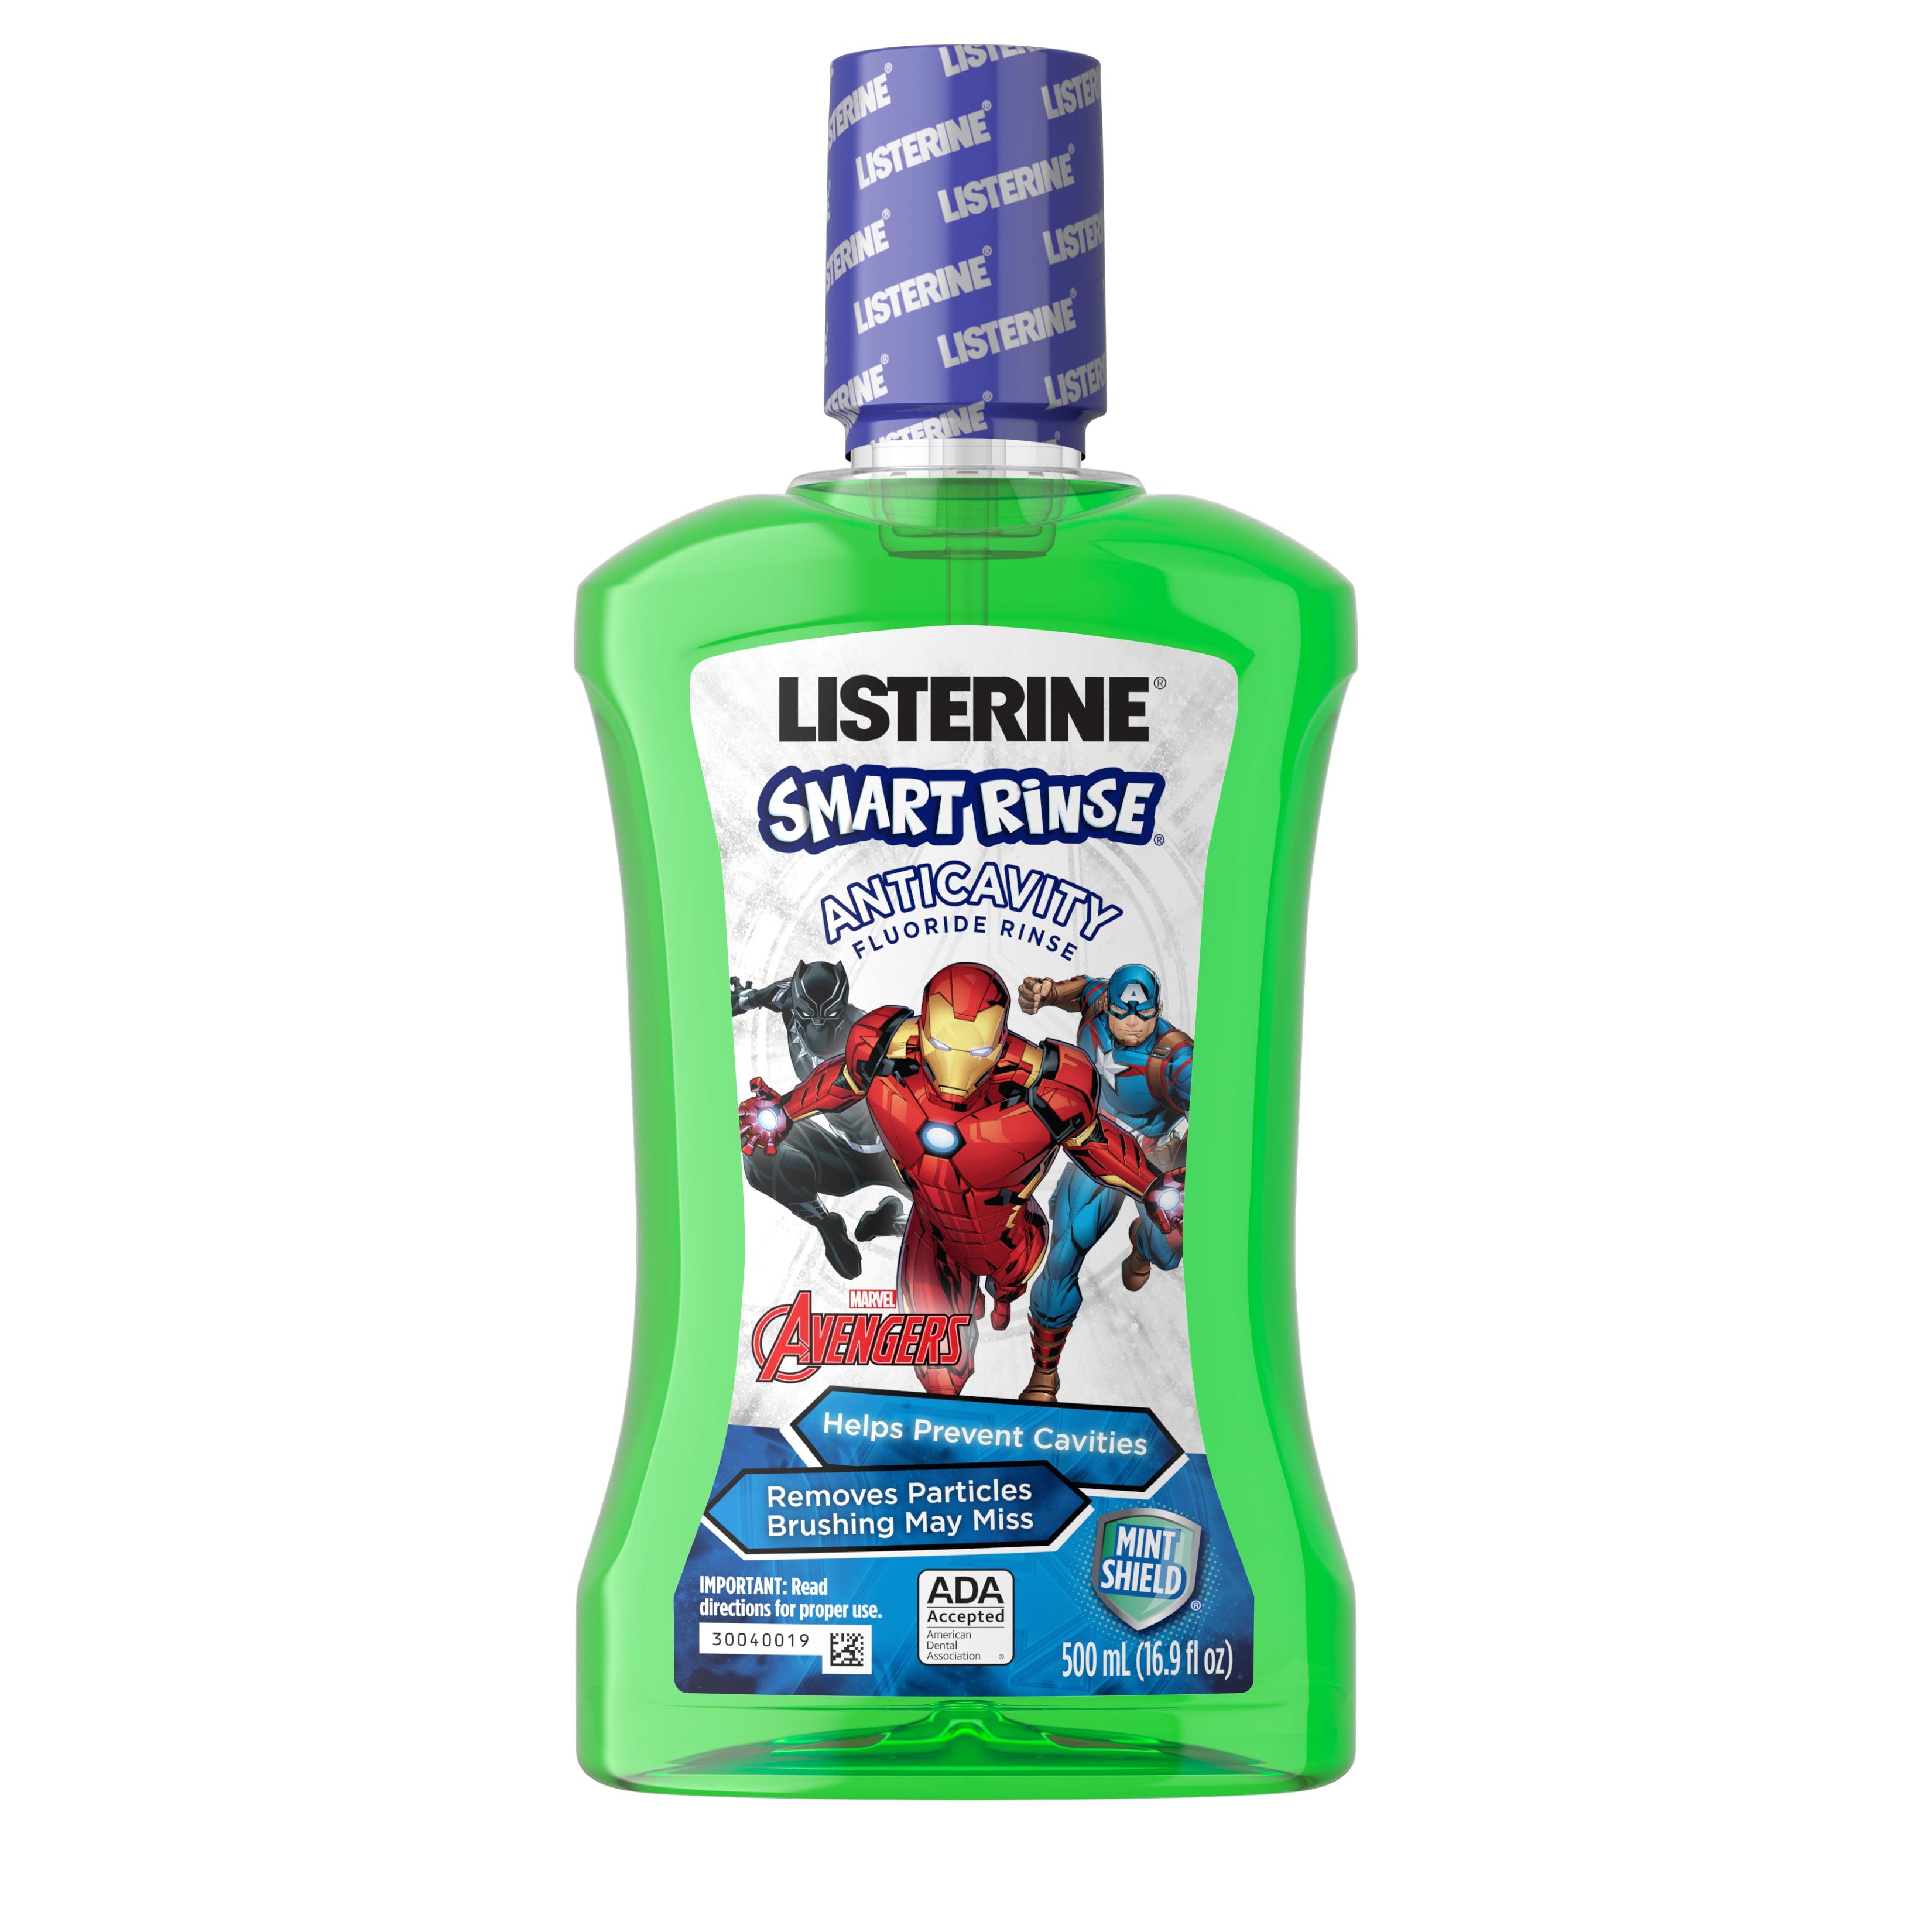 Listerine Smart Rinse Kids Alcohol-Free Mouthwash, Mint, 500 mL